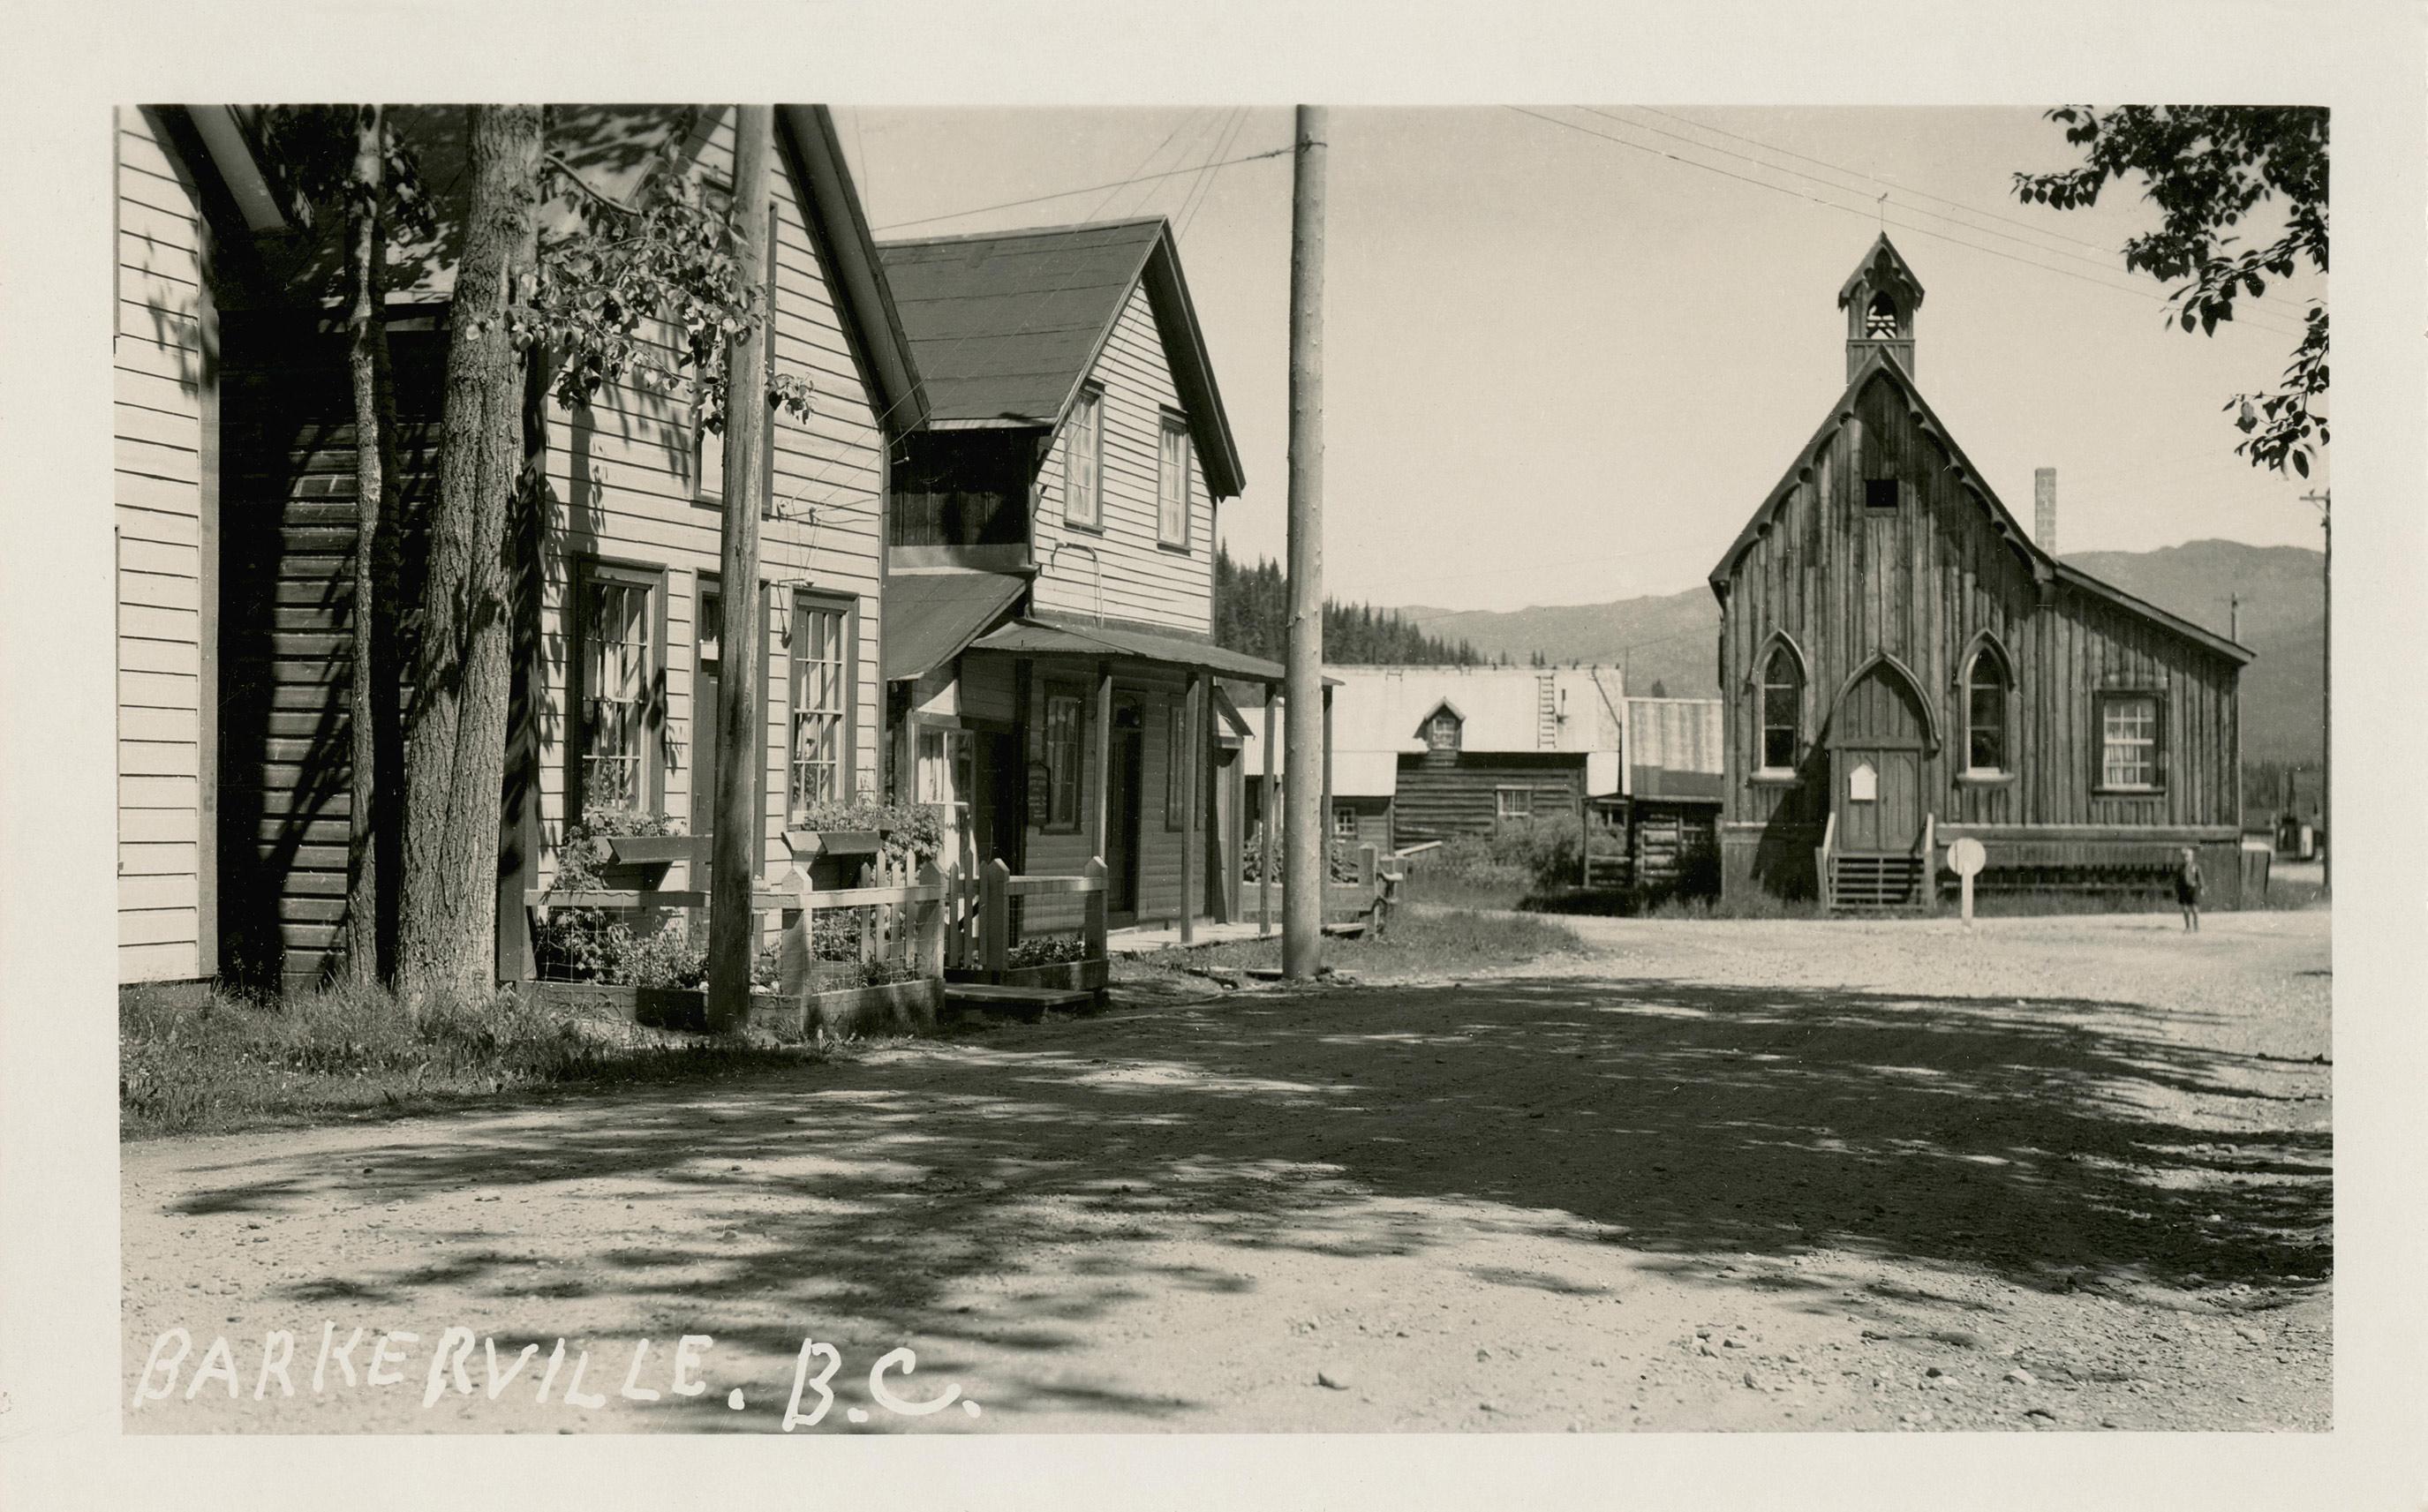 Exploring British Columbia's historic towns through Open